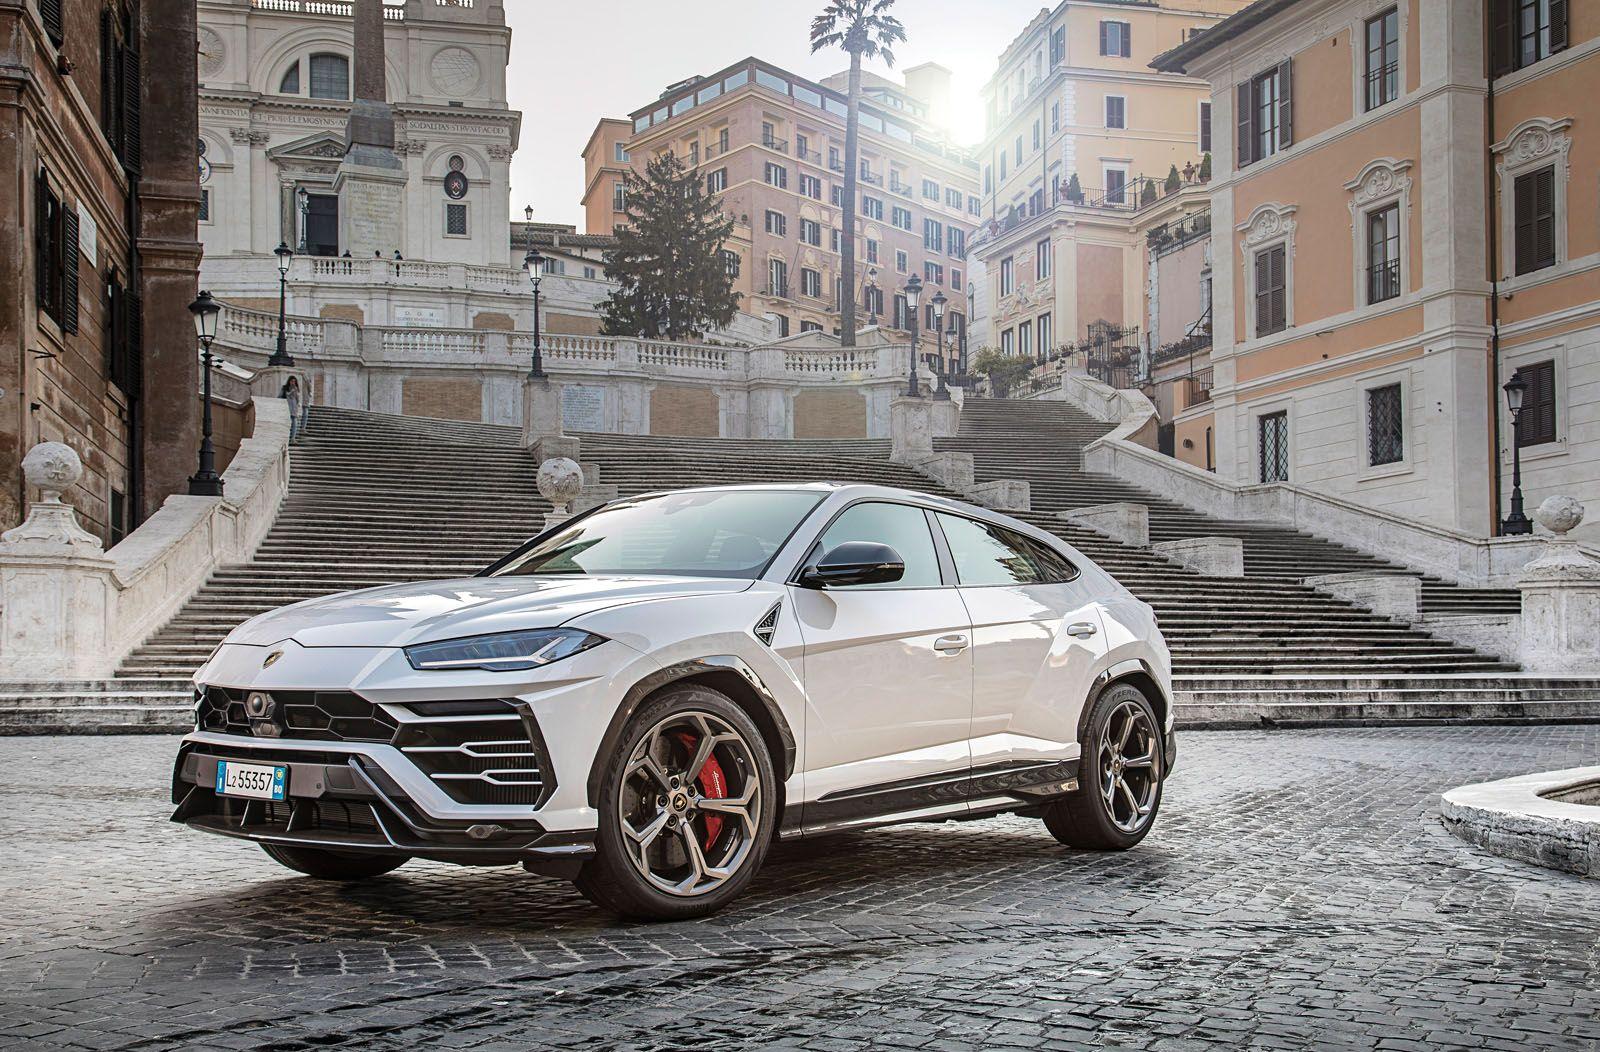 Is The Lamborghini Urus The Fastest SUV?